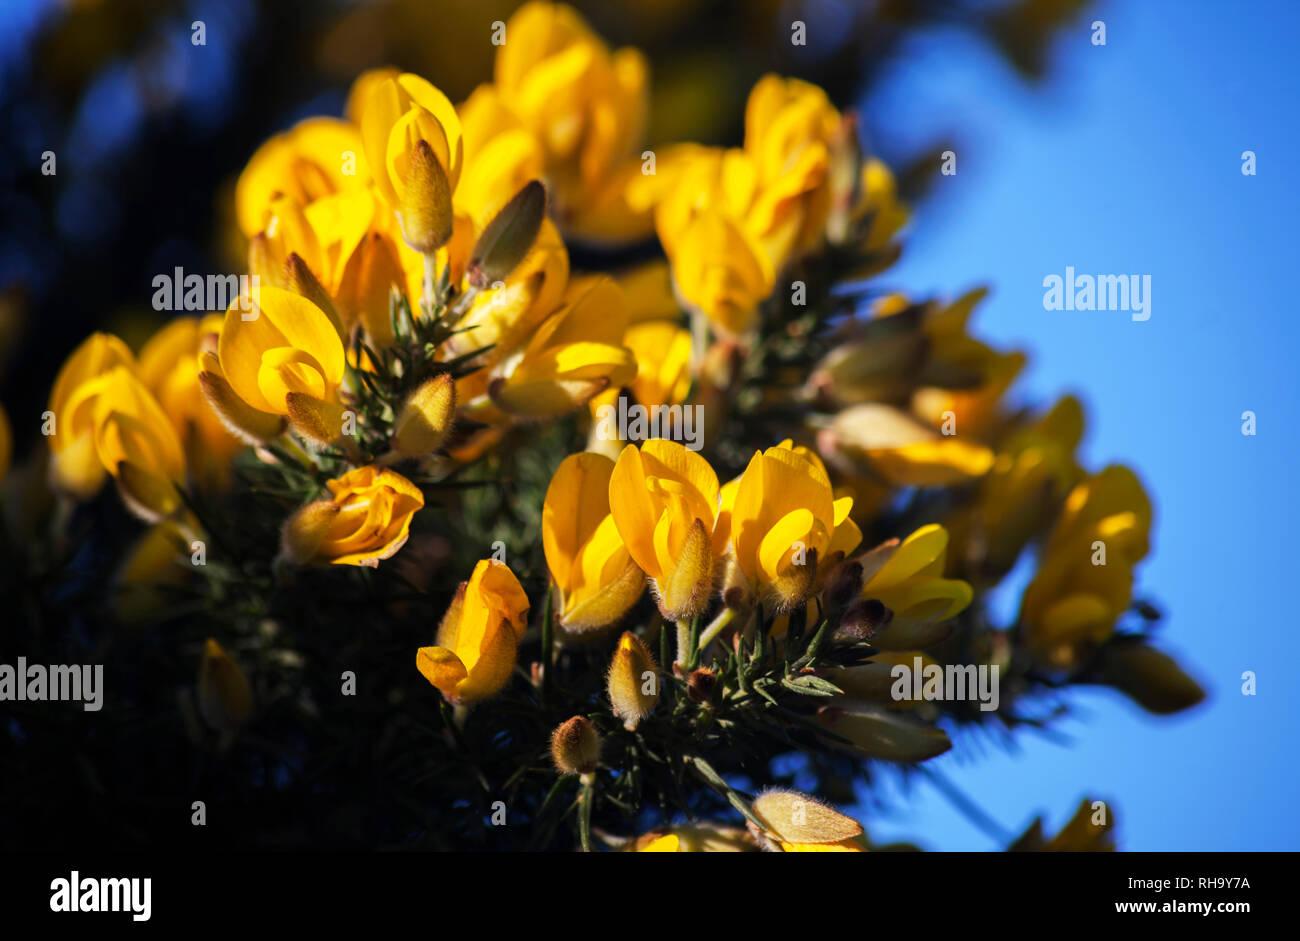 Flores Amarillas Perfumadas Fotos e Imágenes de stock Alamy